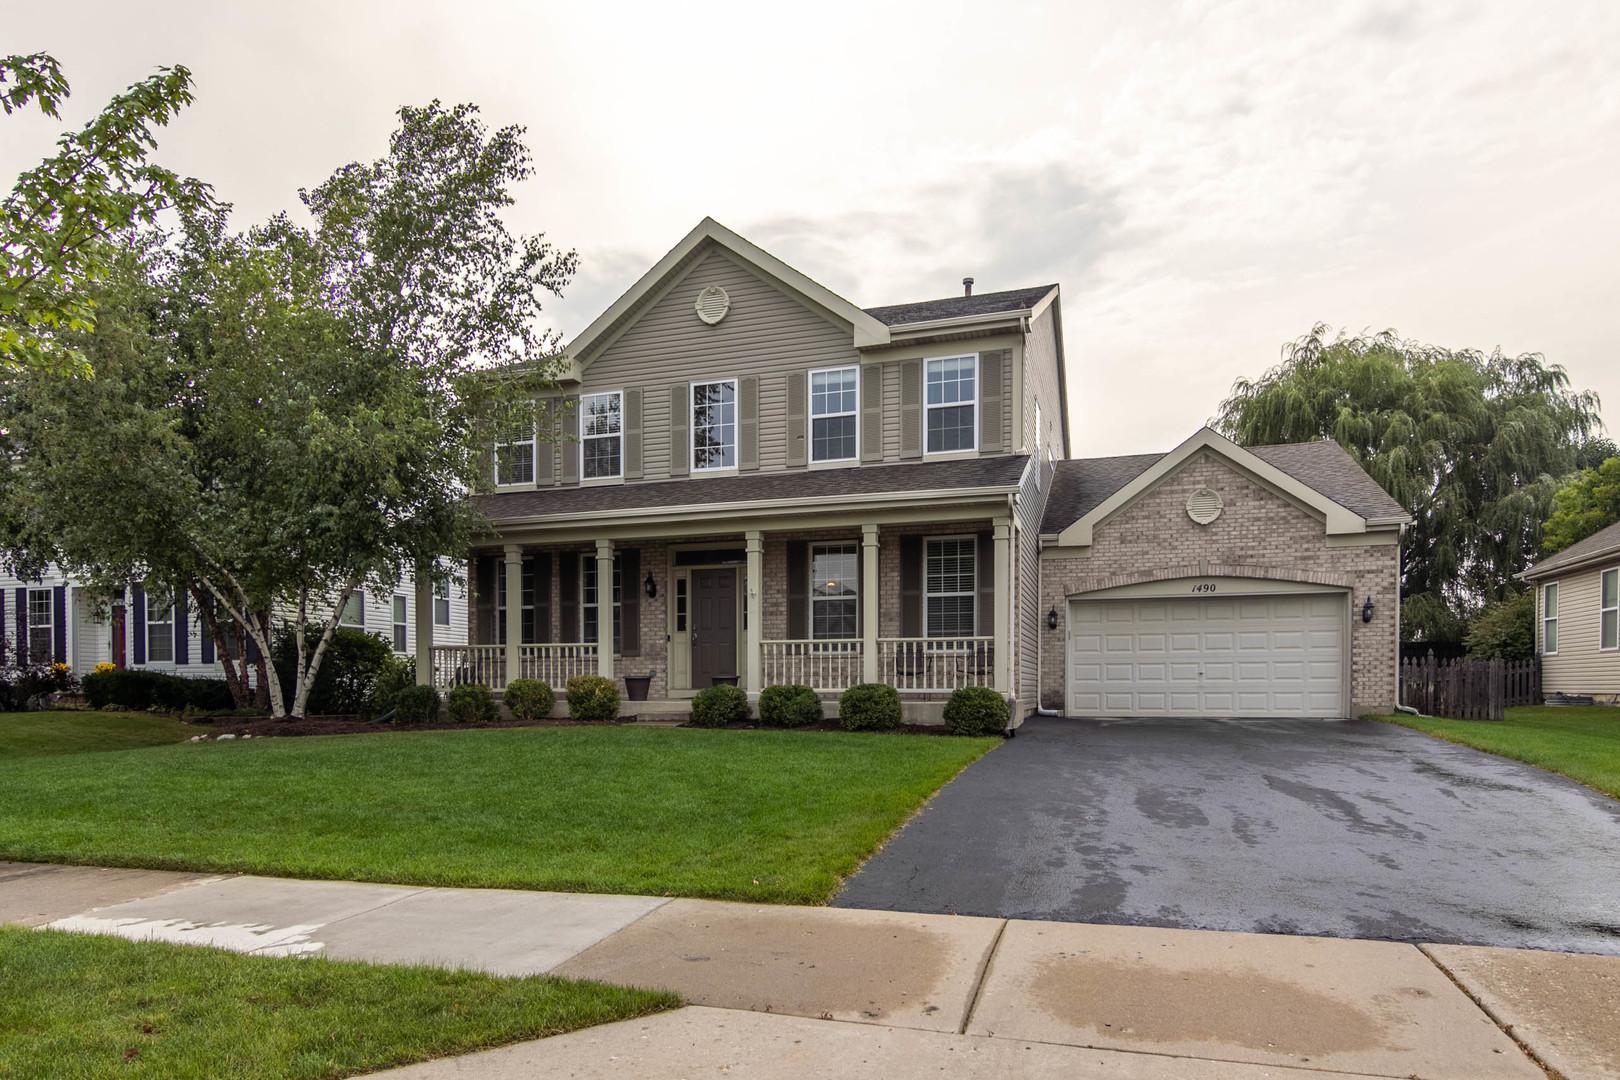 1490 South Lancaster Lane, Libertyville, Illinois 60048